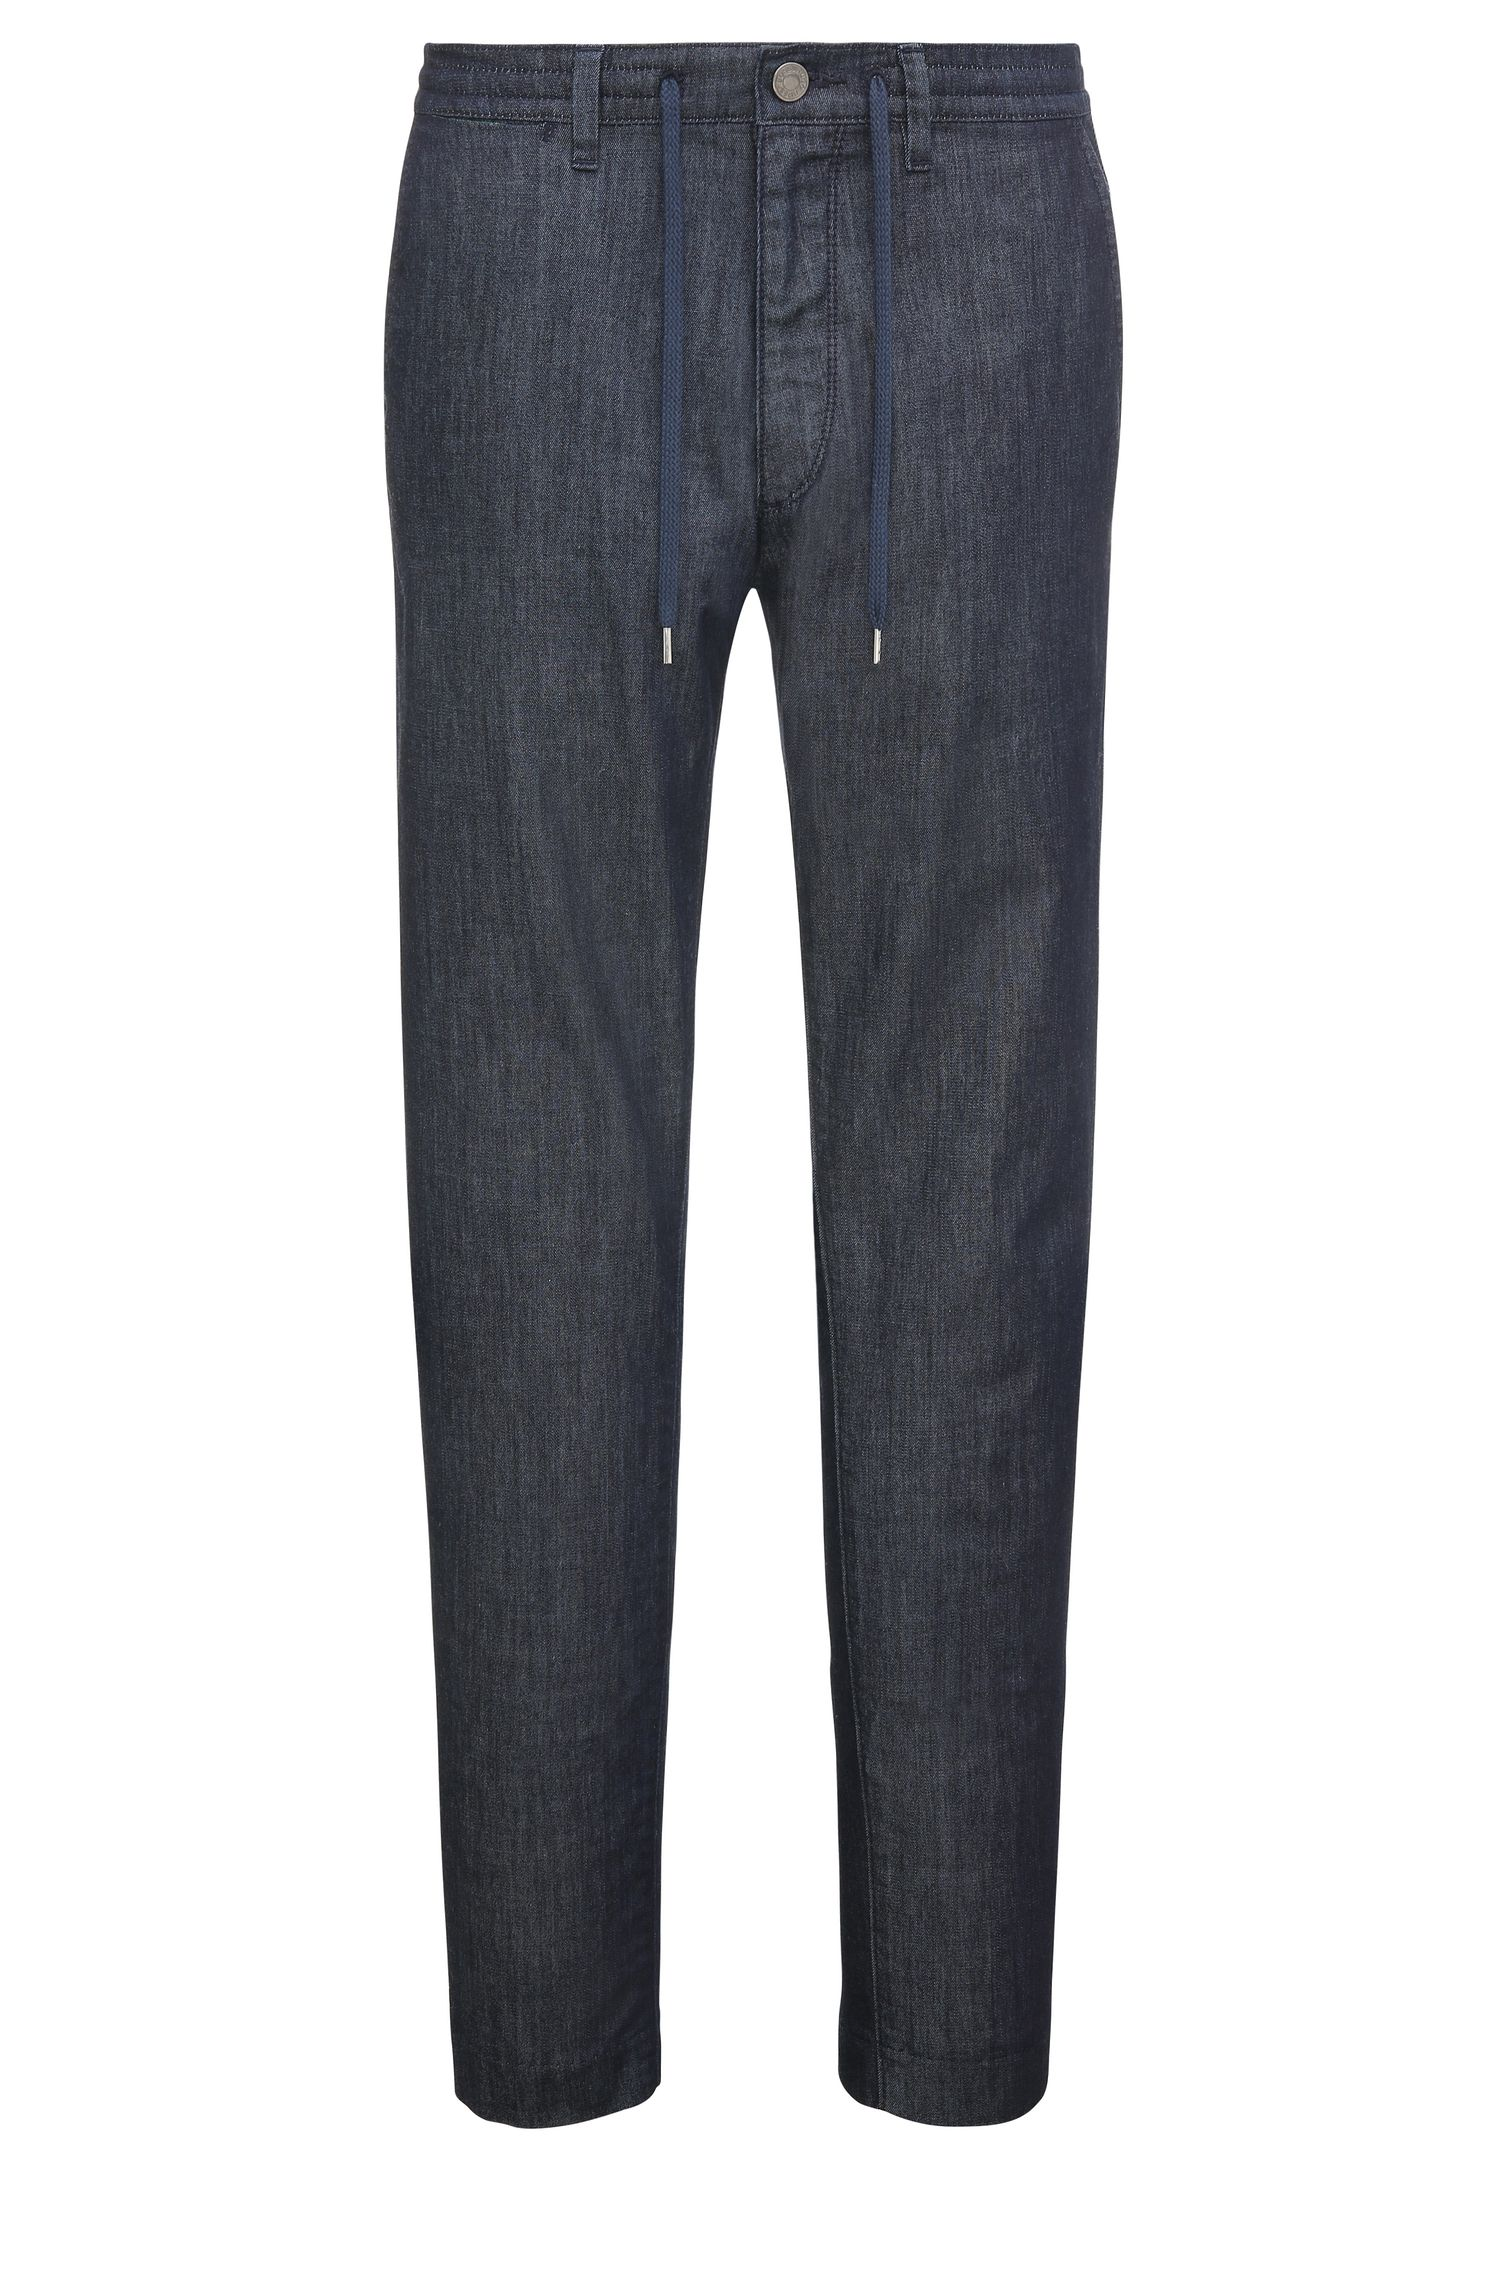 7.6 oz Stretch Cotton Blend Jeans, Tapered Fit | Darrel